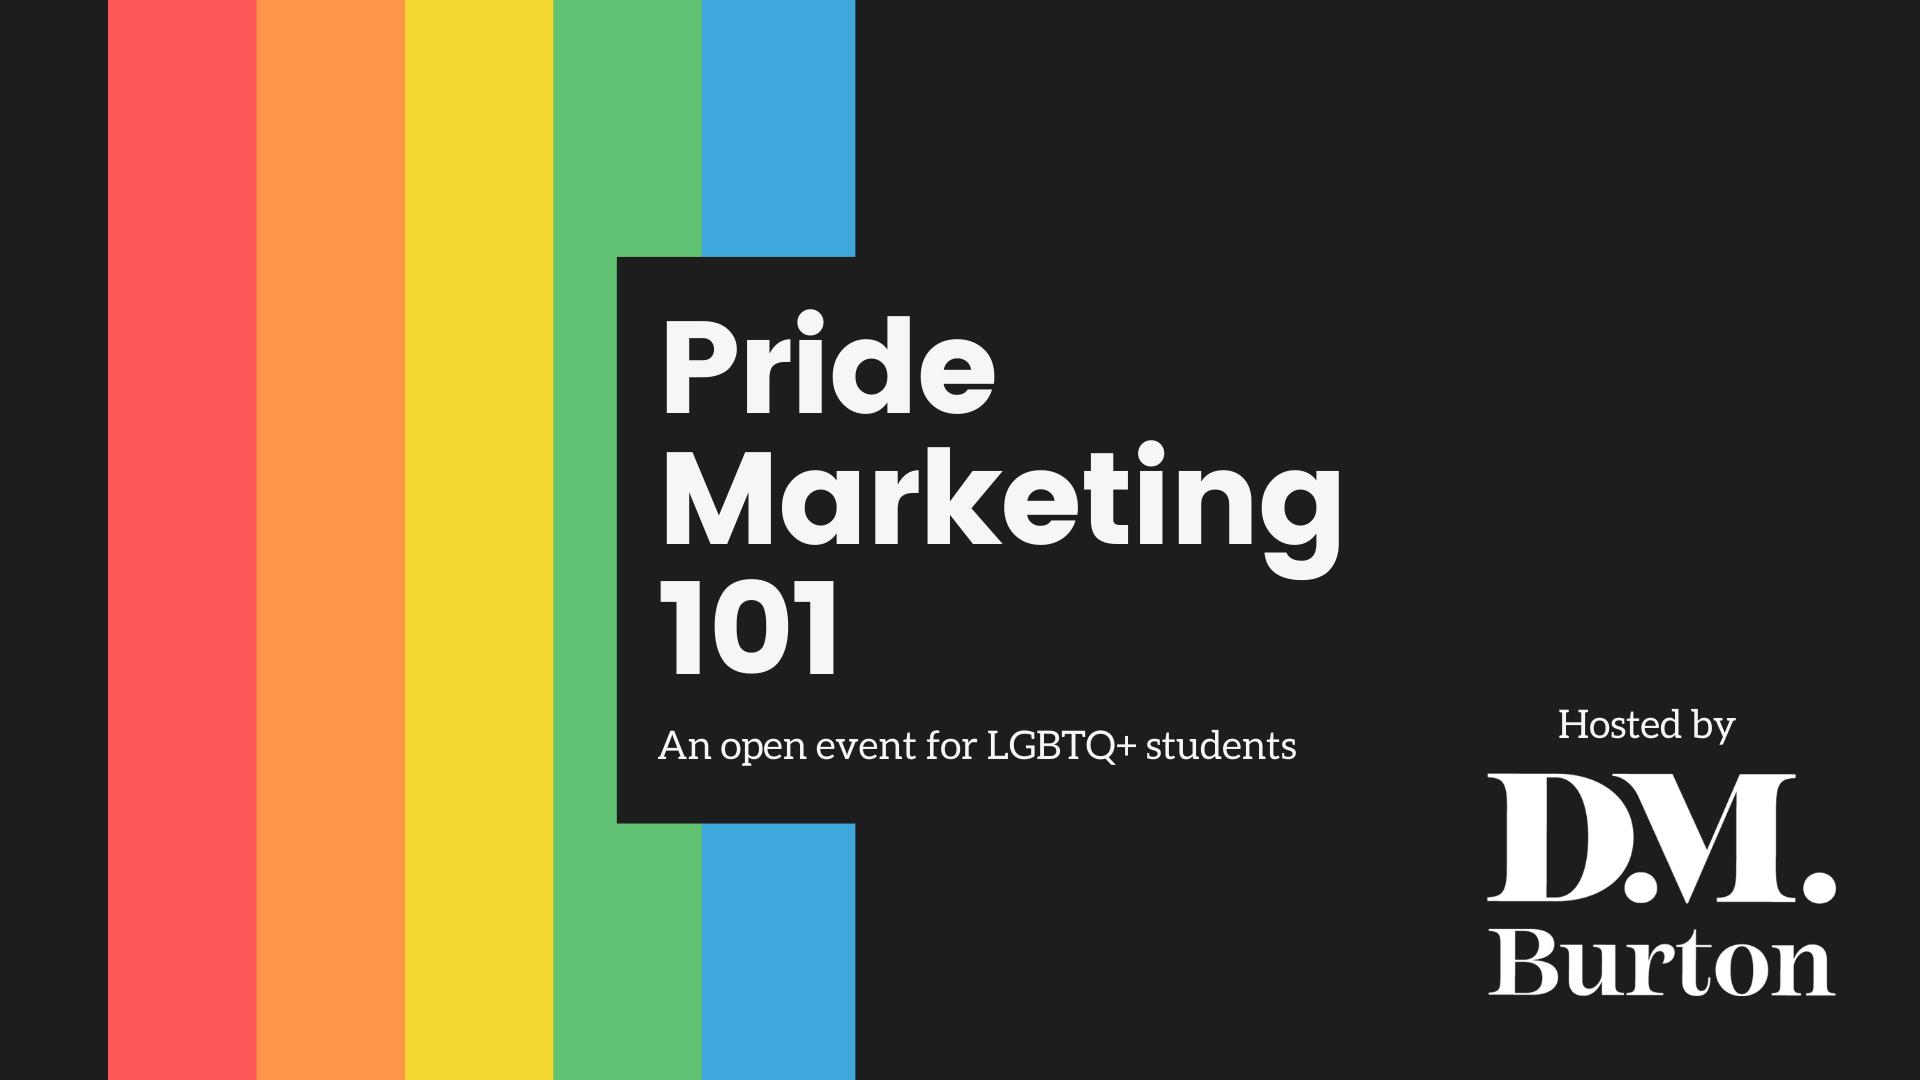 Pride Marketing 101